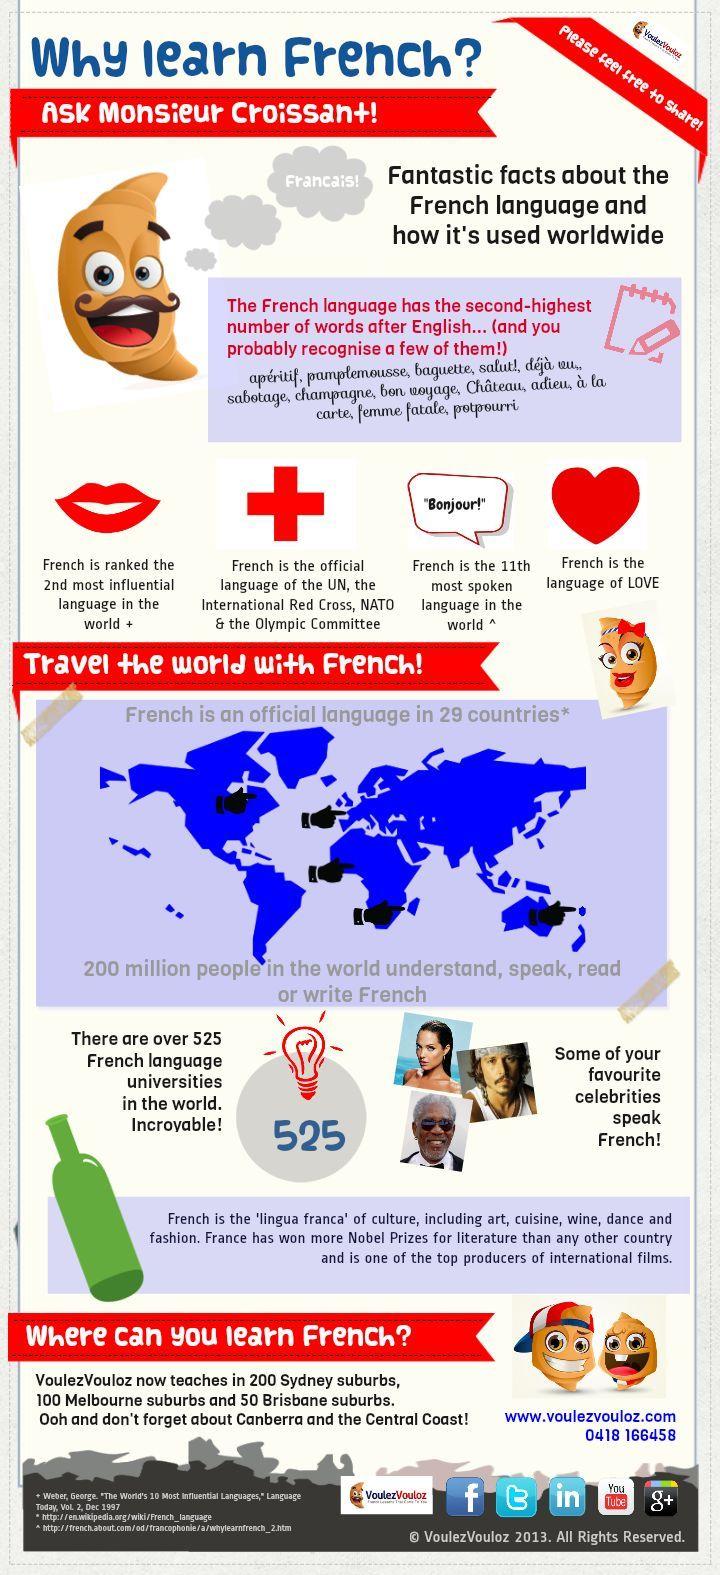 monsieur croissant infographic - Google Search